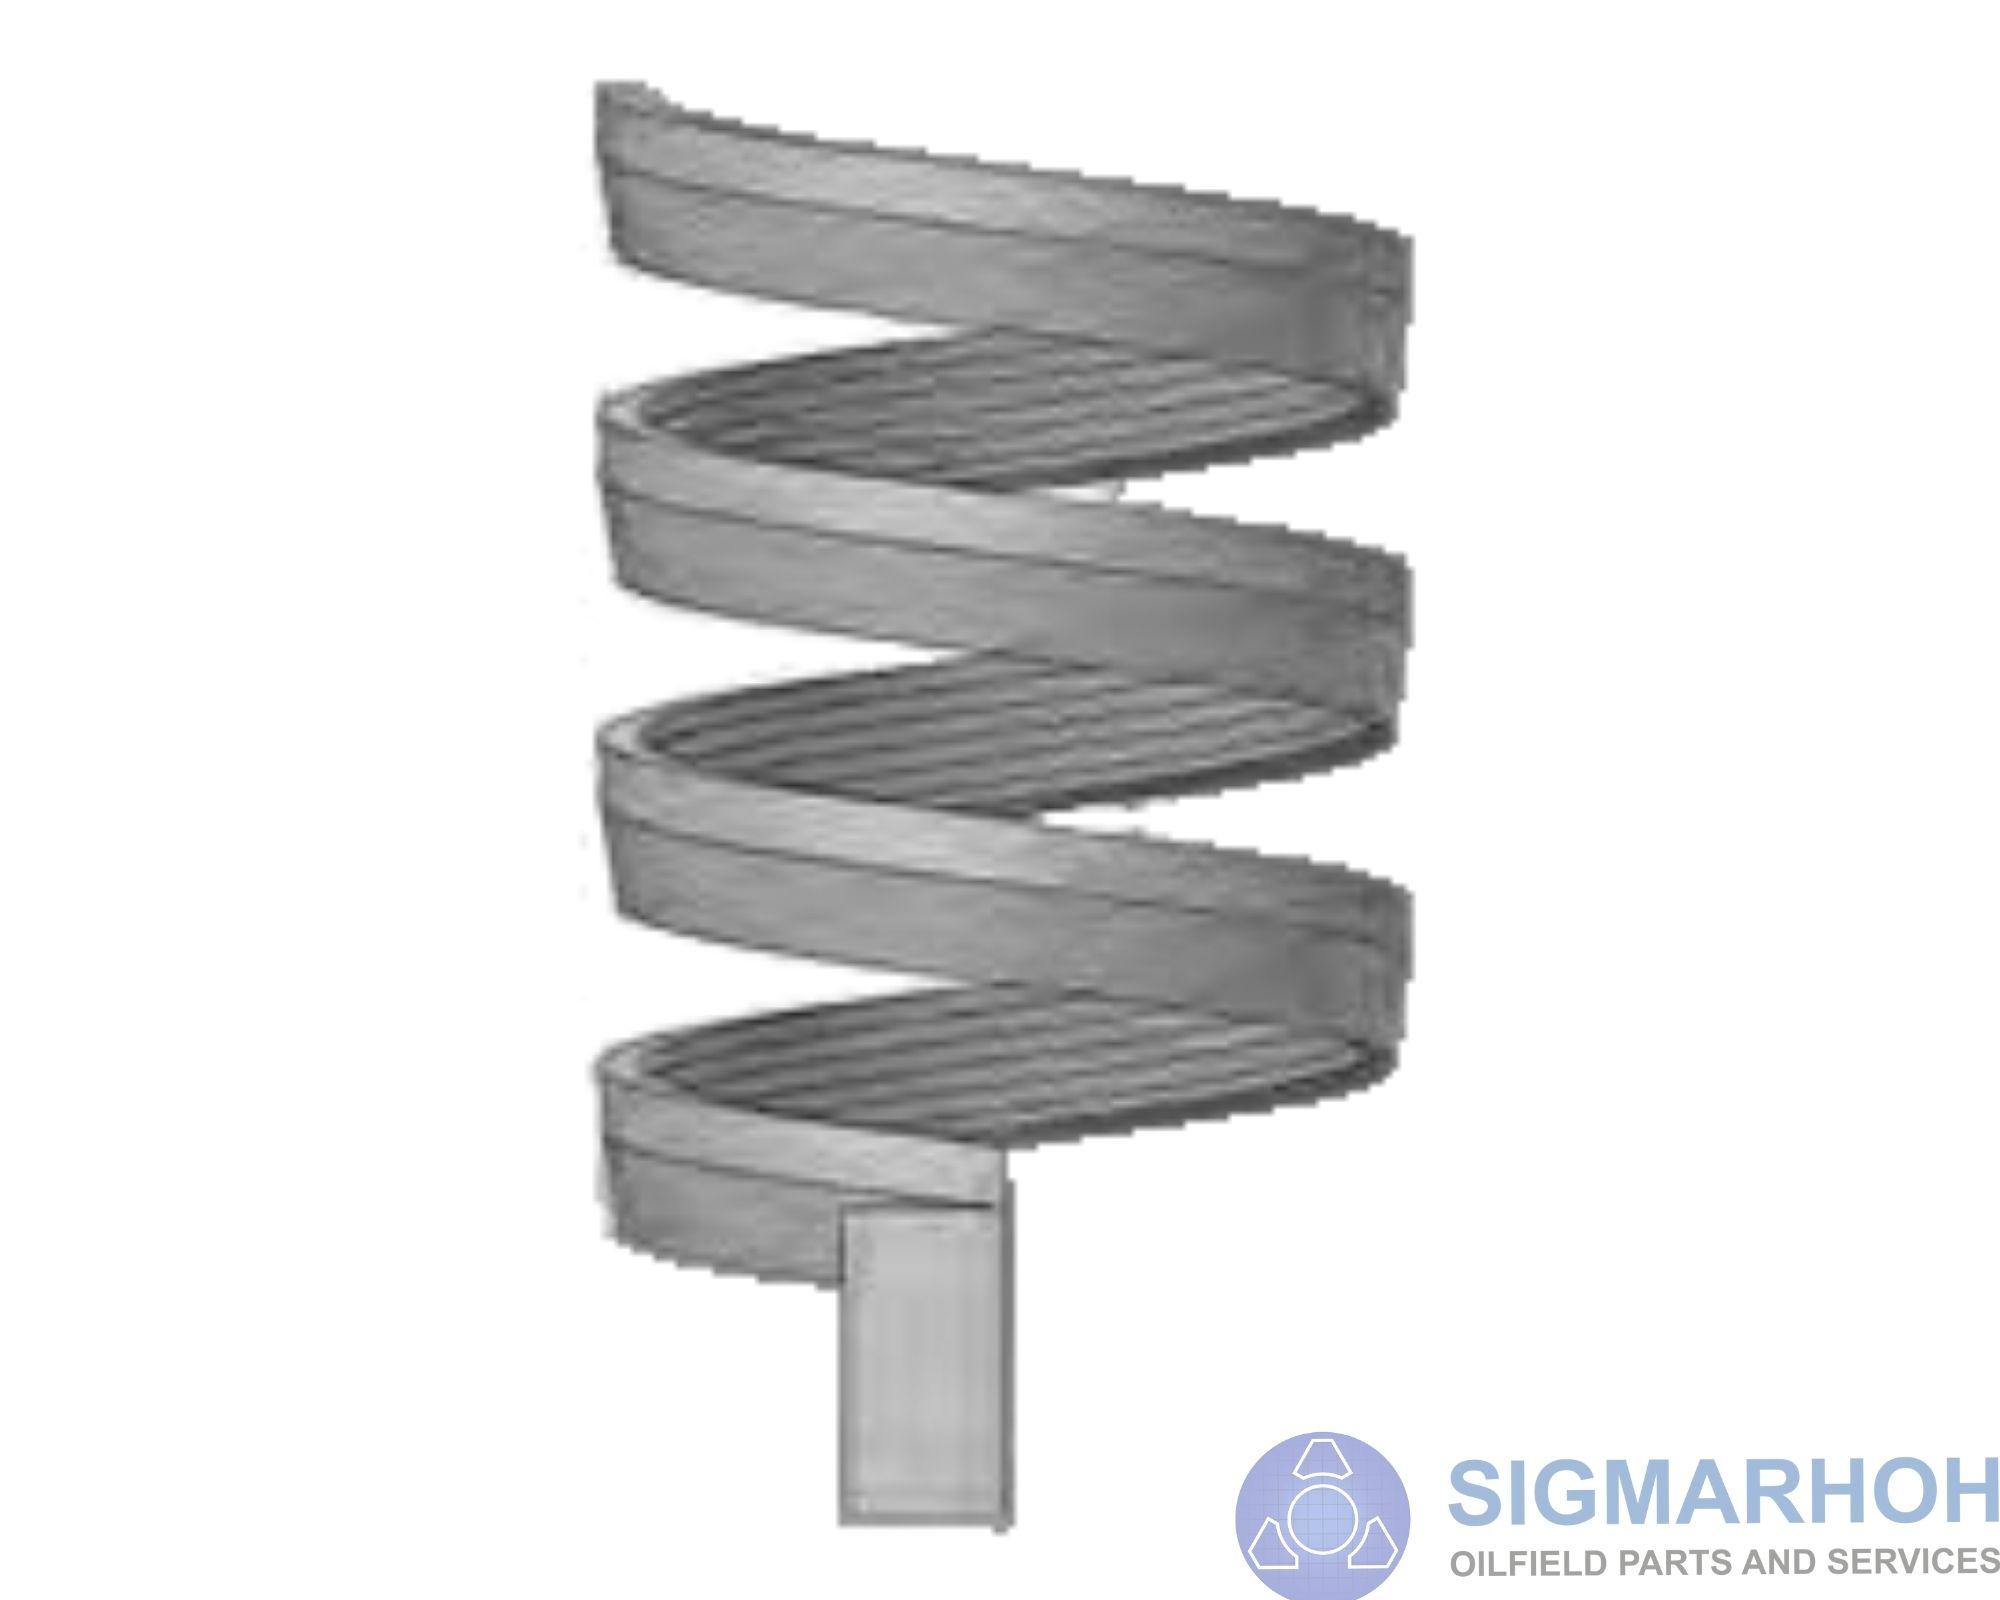 Garra em Espiral para Overshot Série 150 / Spiral Grapple for Overshot serie 150